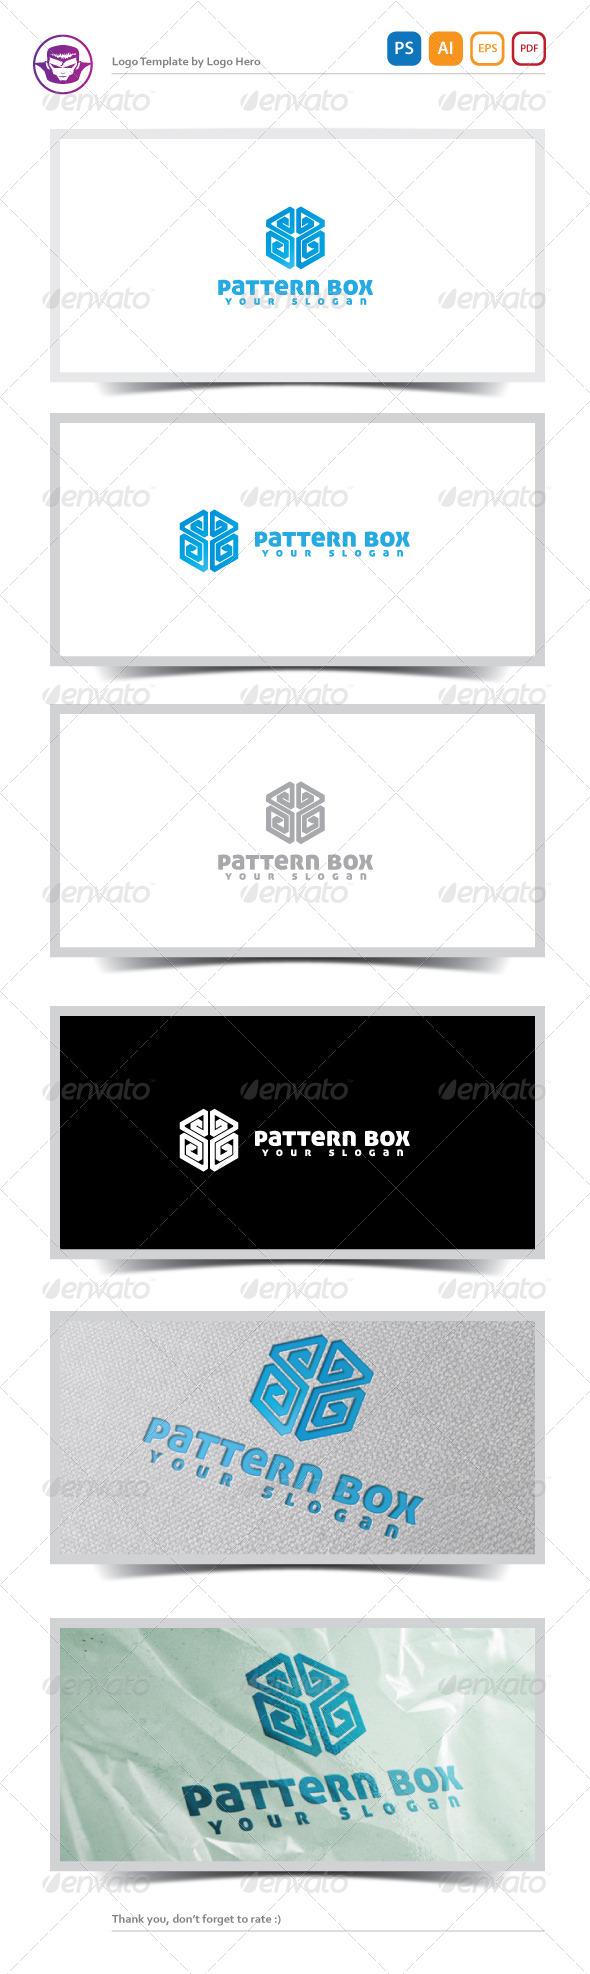 GraphicRiver Pattern Box Logo Template 5189640